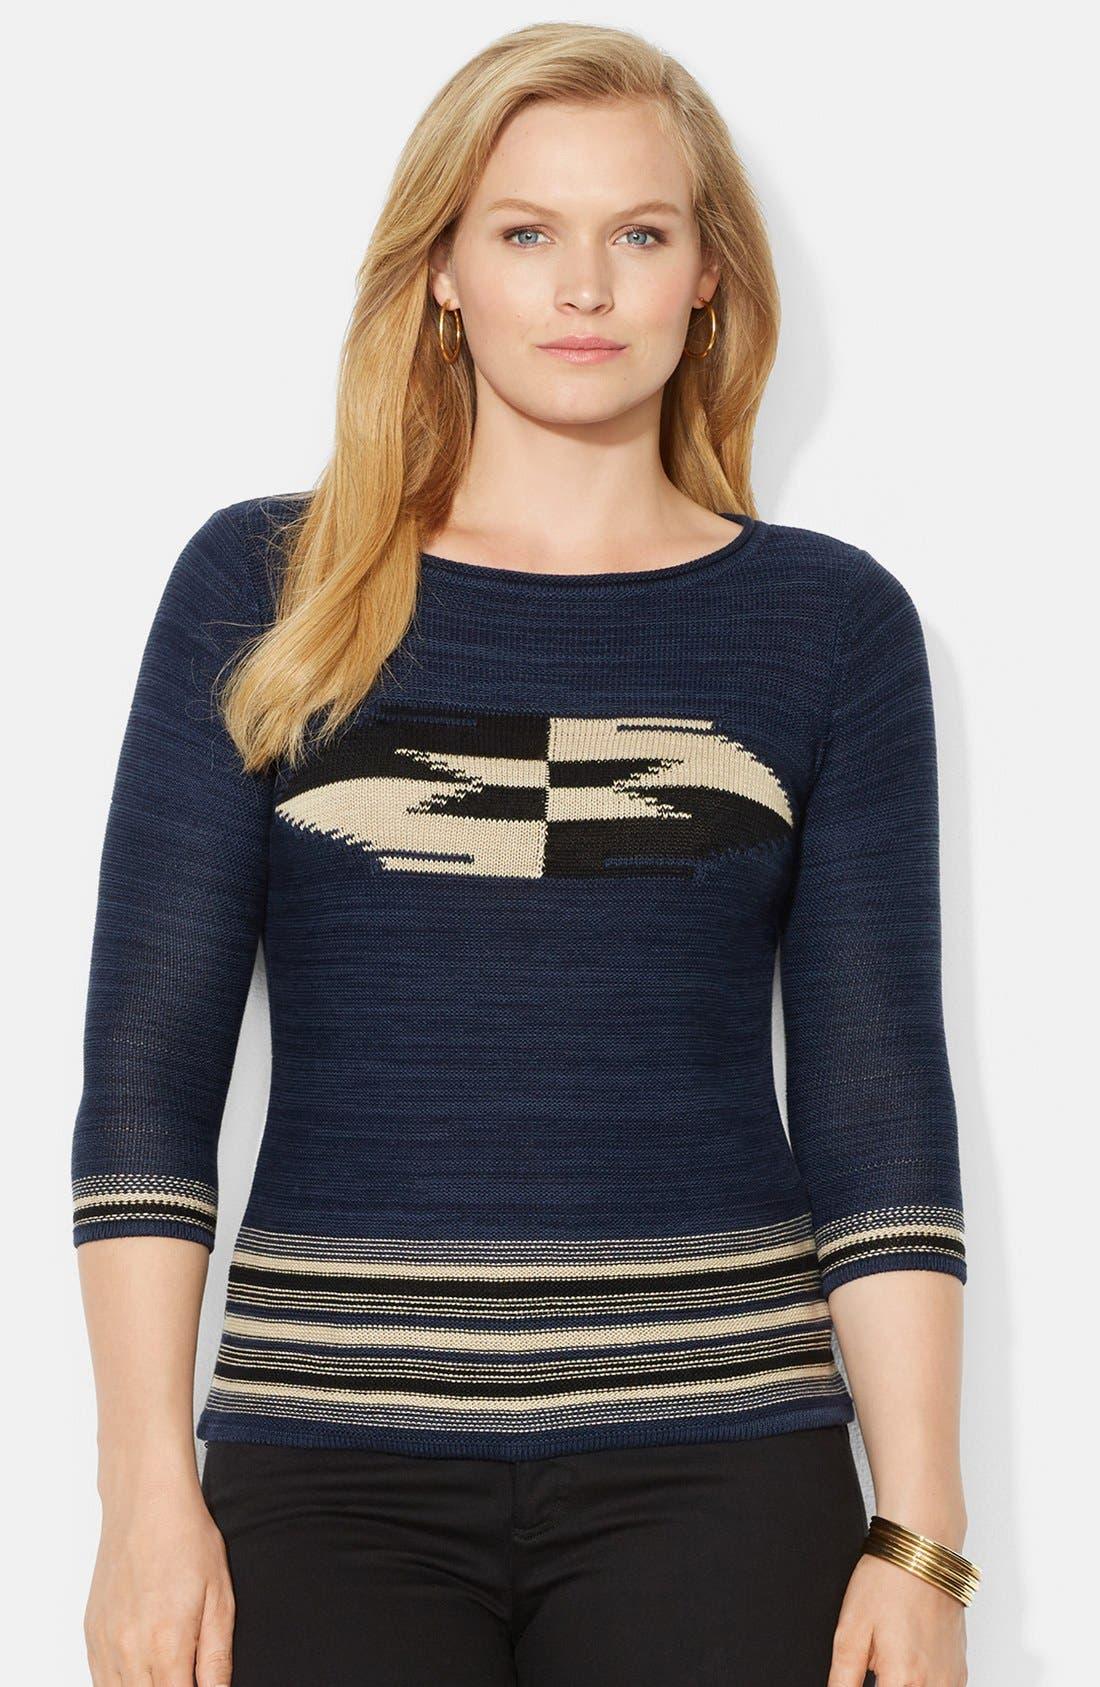 Alternate Image 1 Selected - Lauren Ralph Lauren Ballet Neck Patterned Sweater (Plus Size)